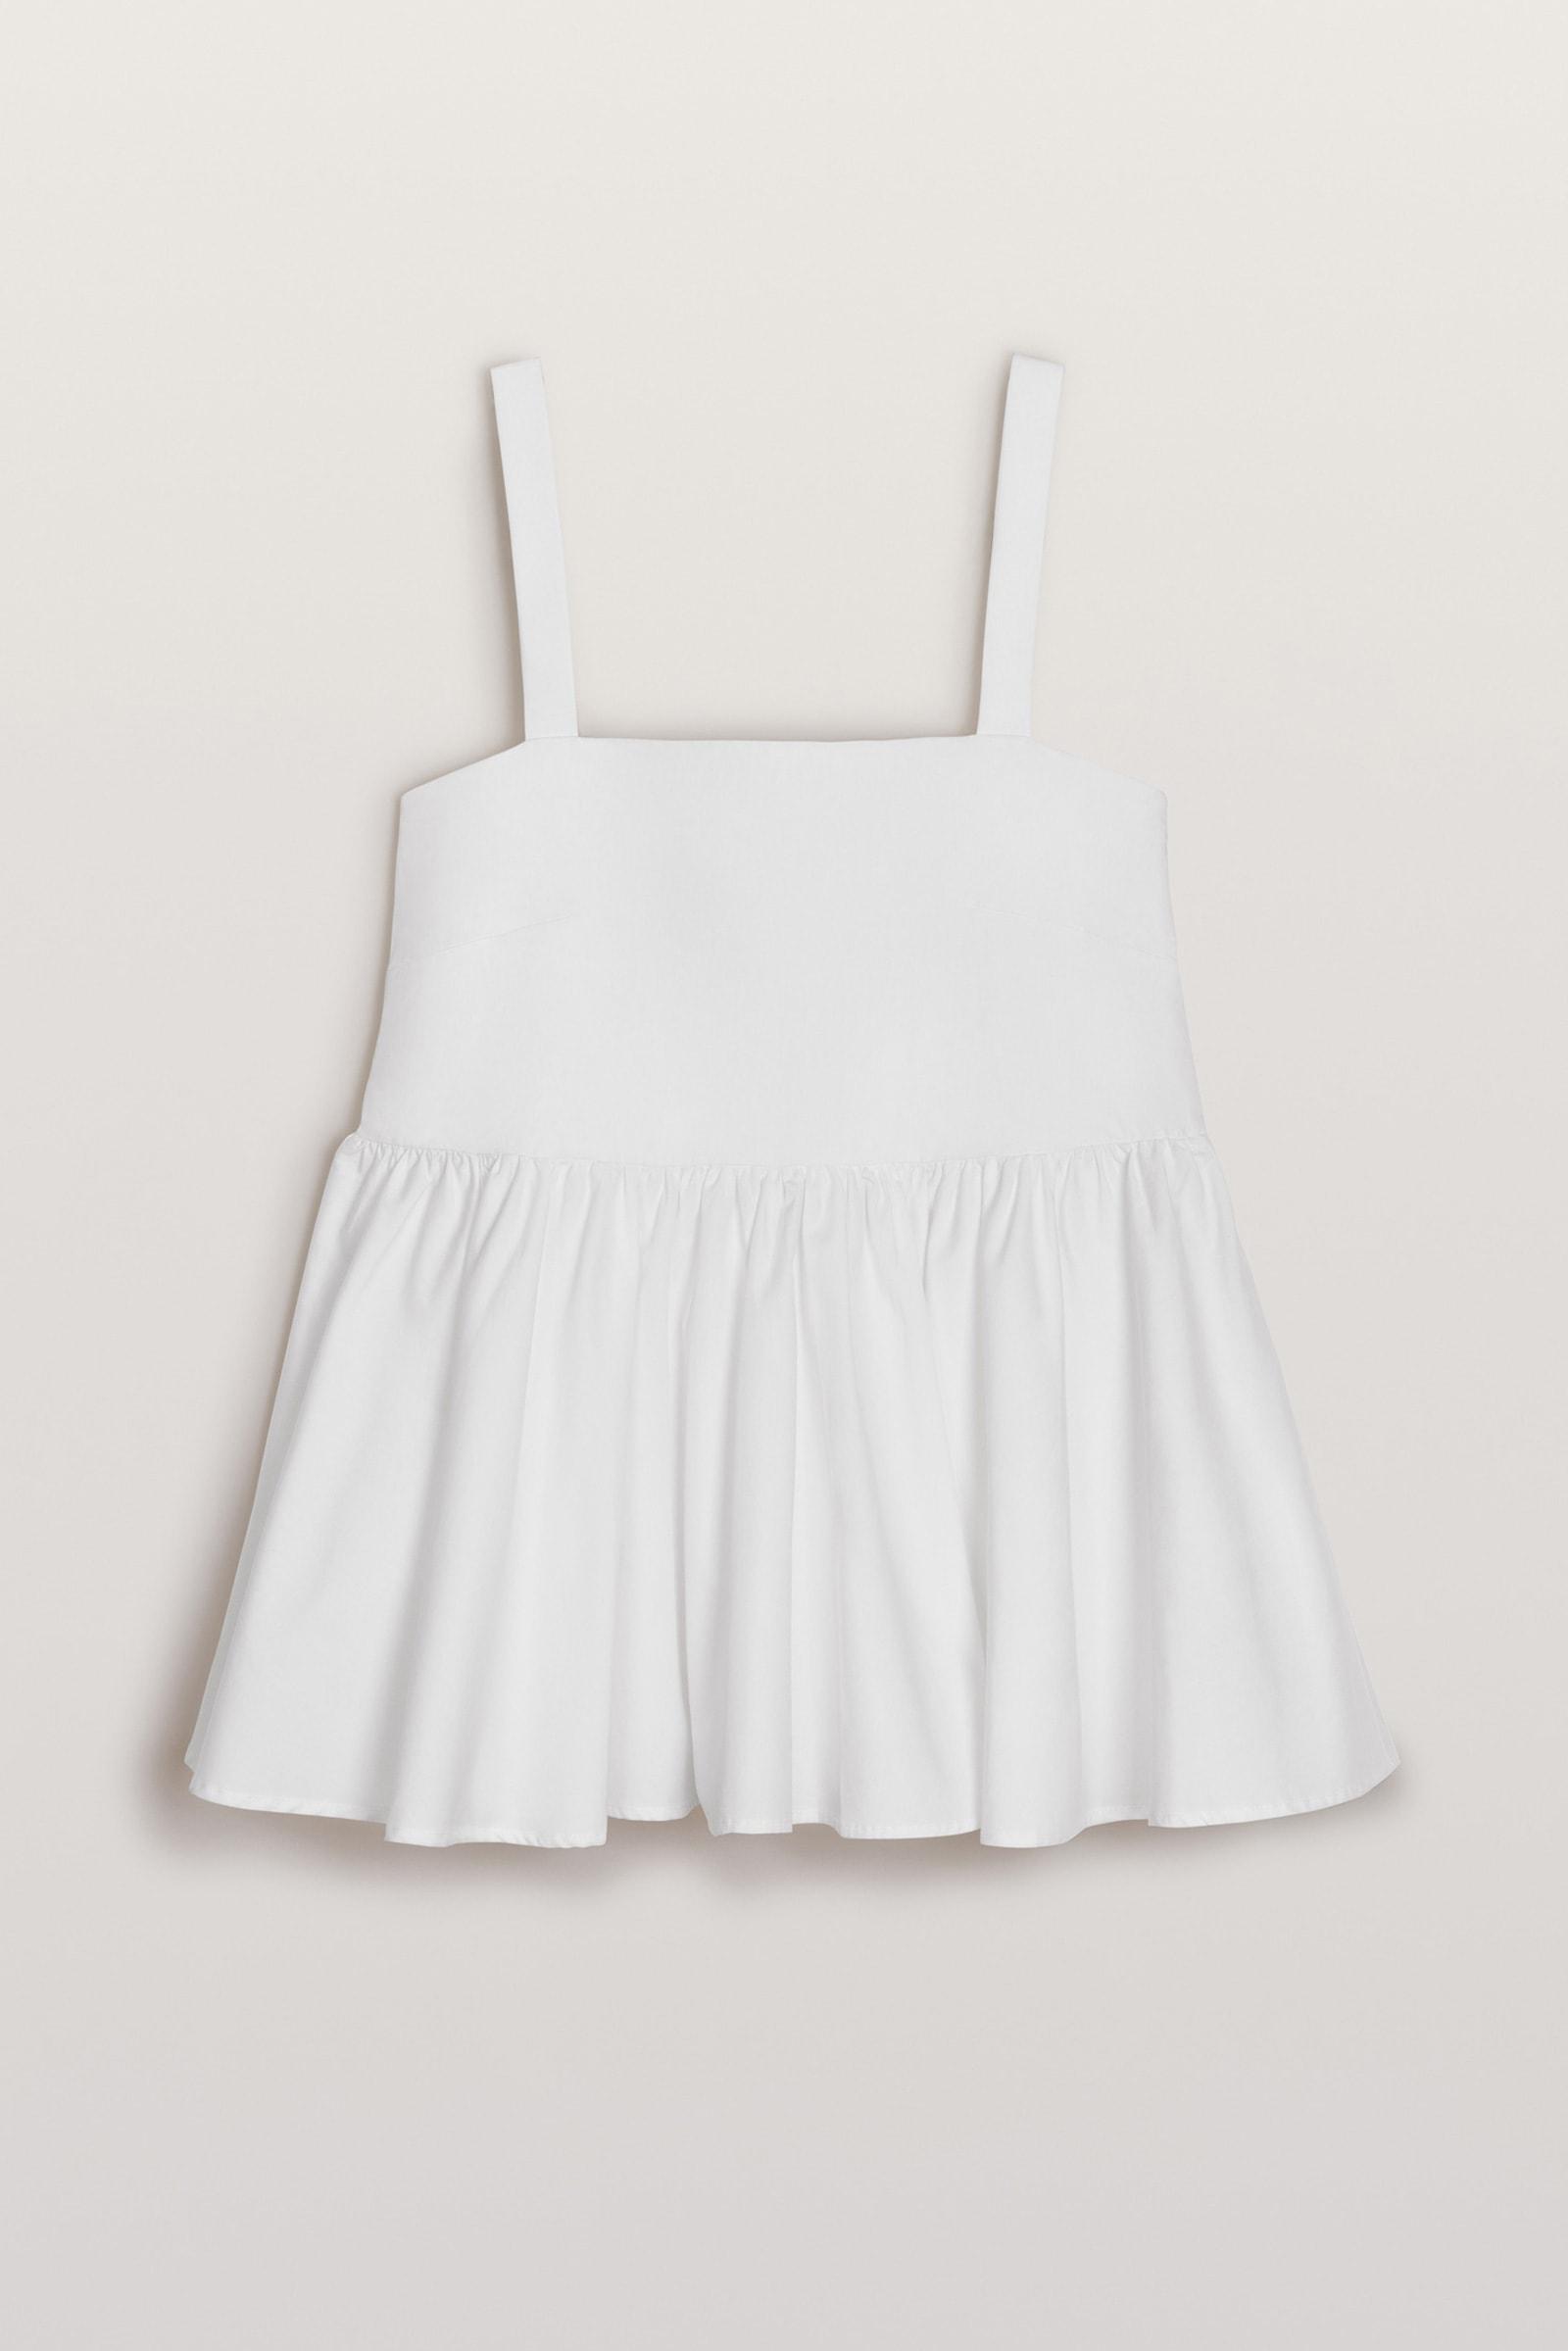 Peplum Sommer Top in Weiß